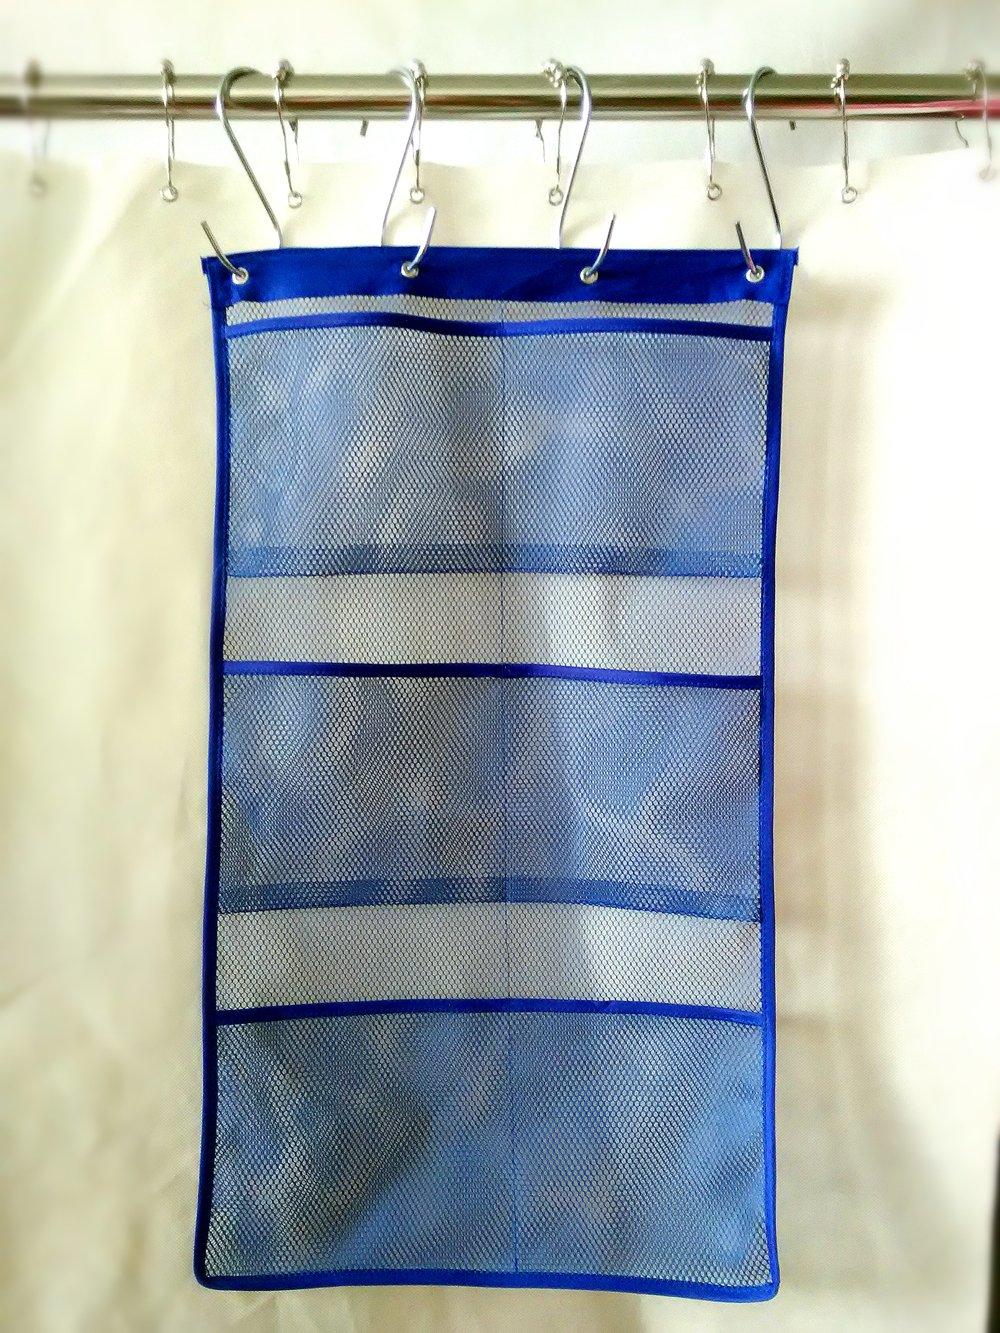 Amazon.com: ALYER 6 Storage Pockets Hanging Mesh Shower Caddy,Space ...